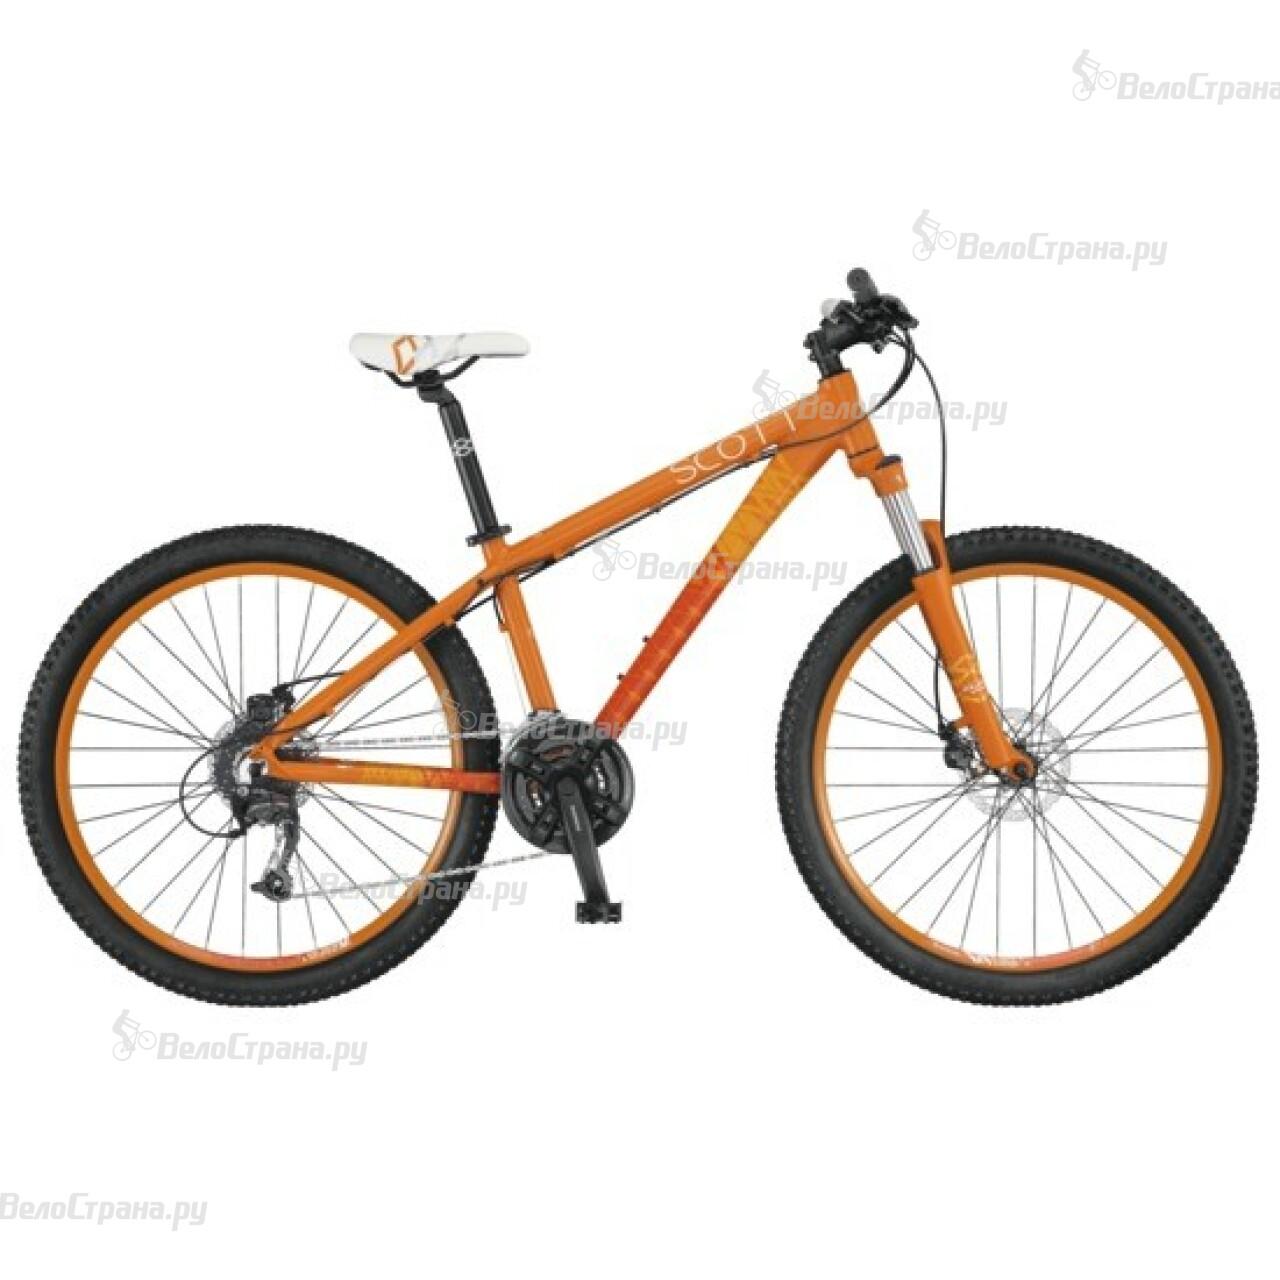 Велосипед Scott Contessa 630 (2014)